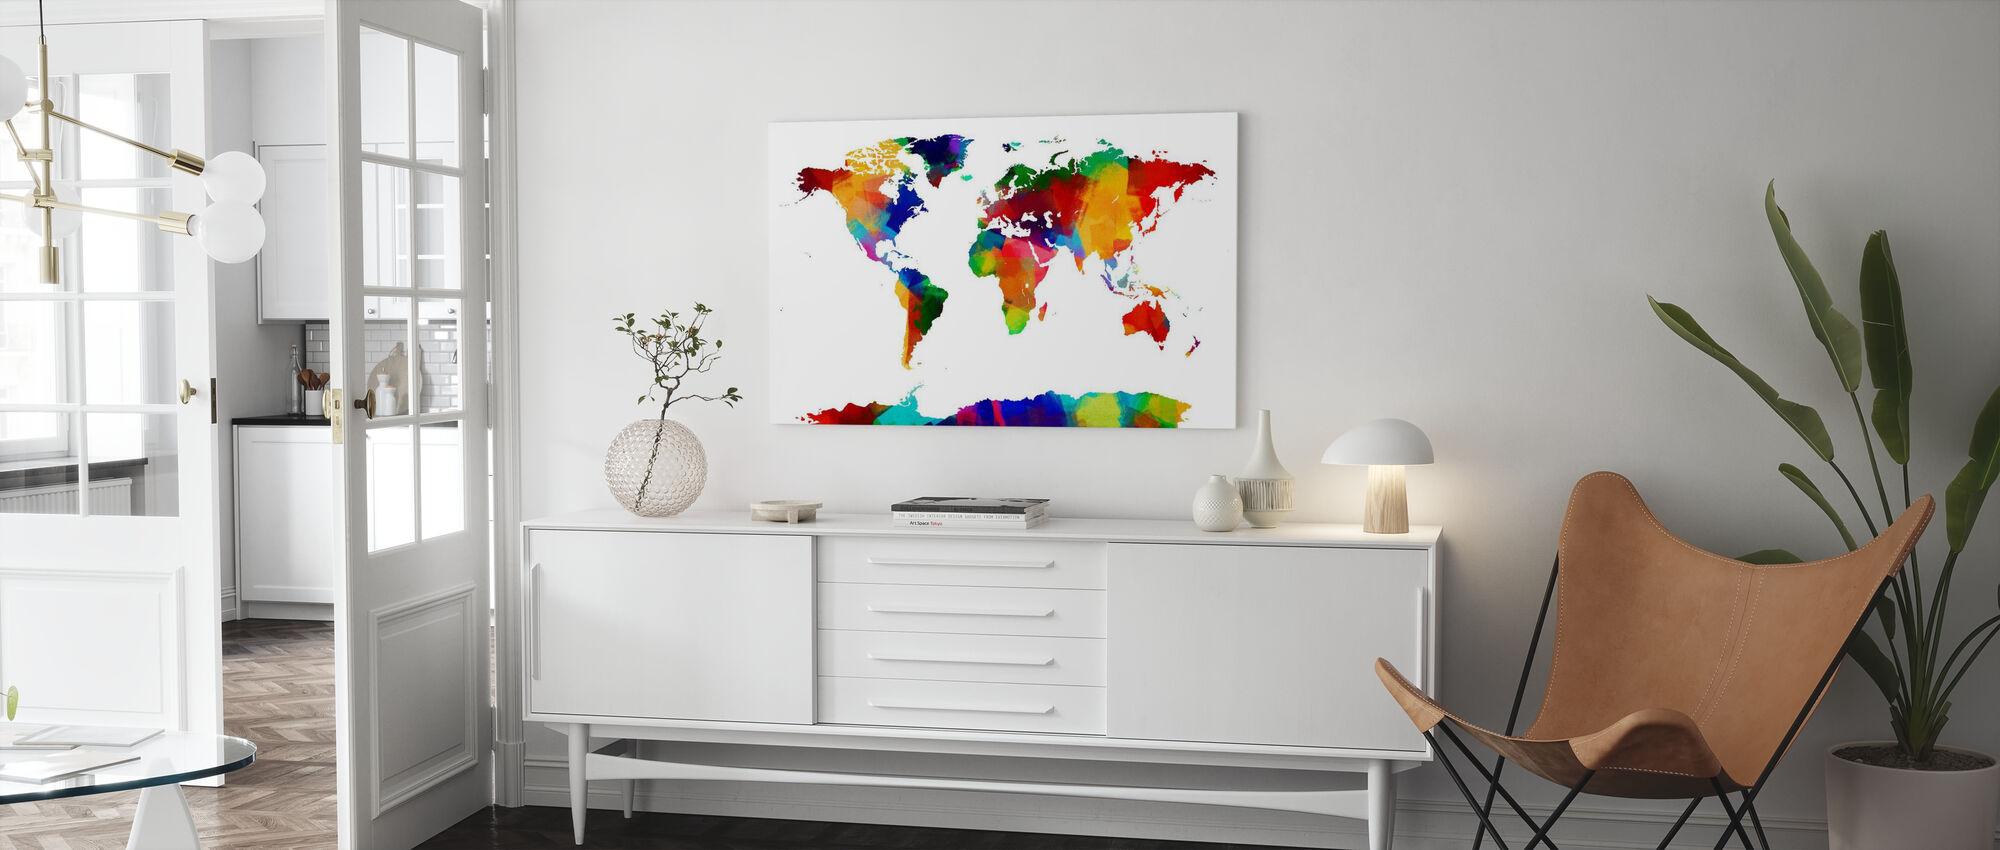 Sponge Paint Weltkarte - Leinwandbild - Wohnzimmer